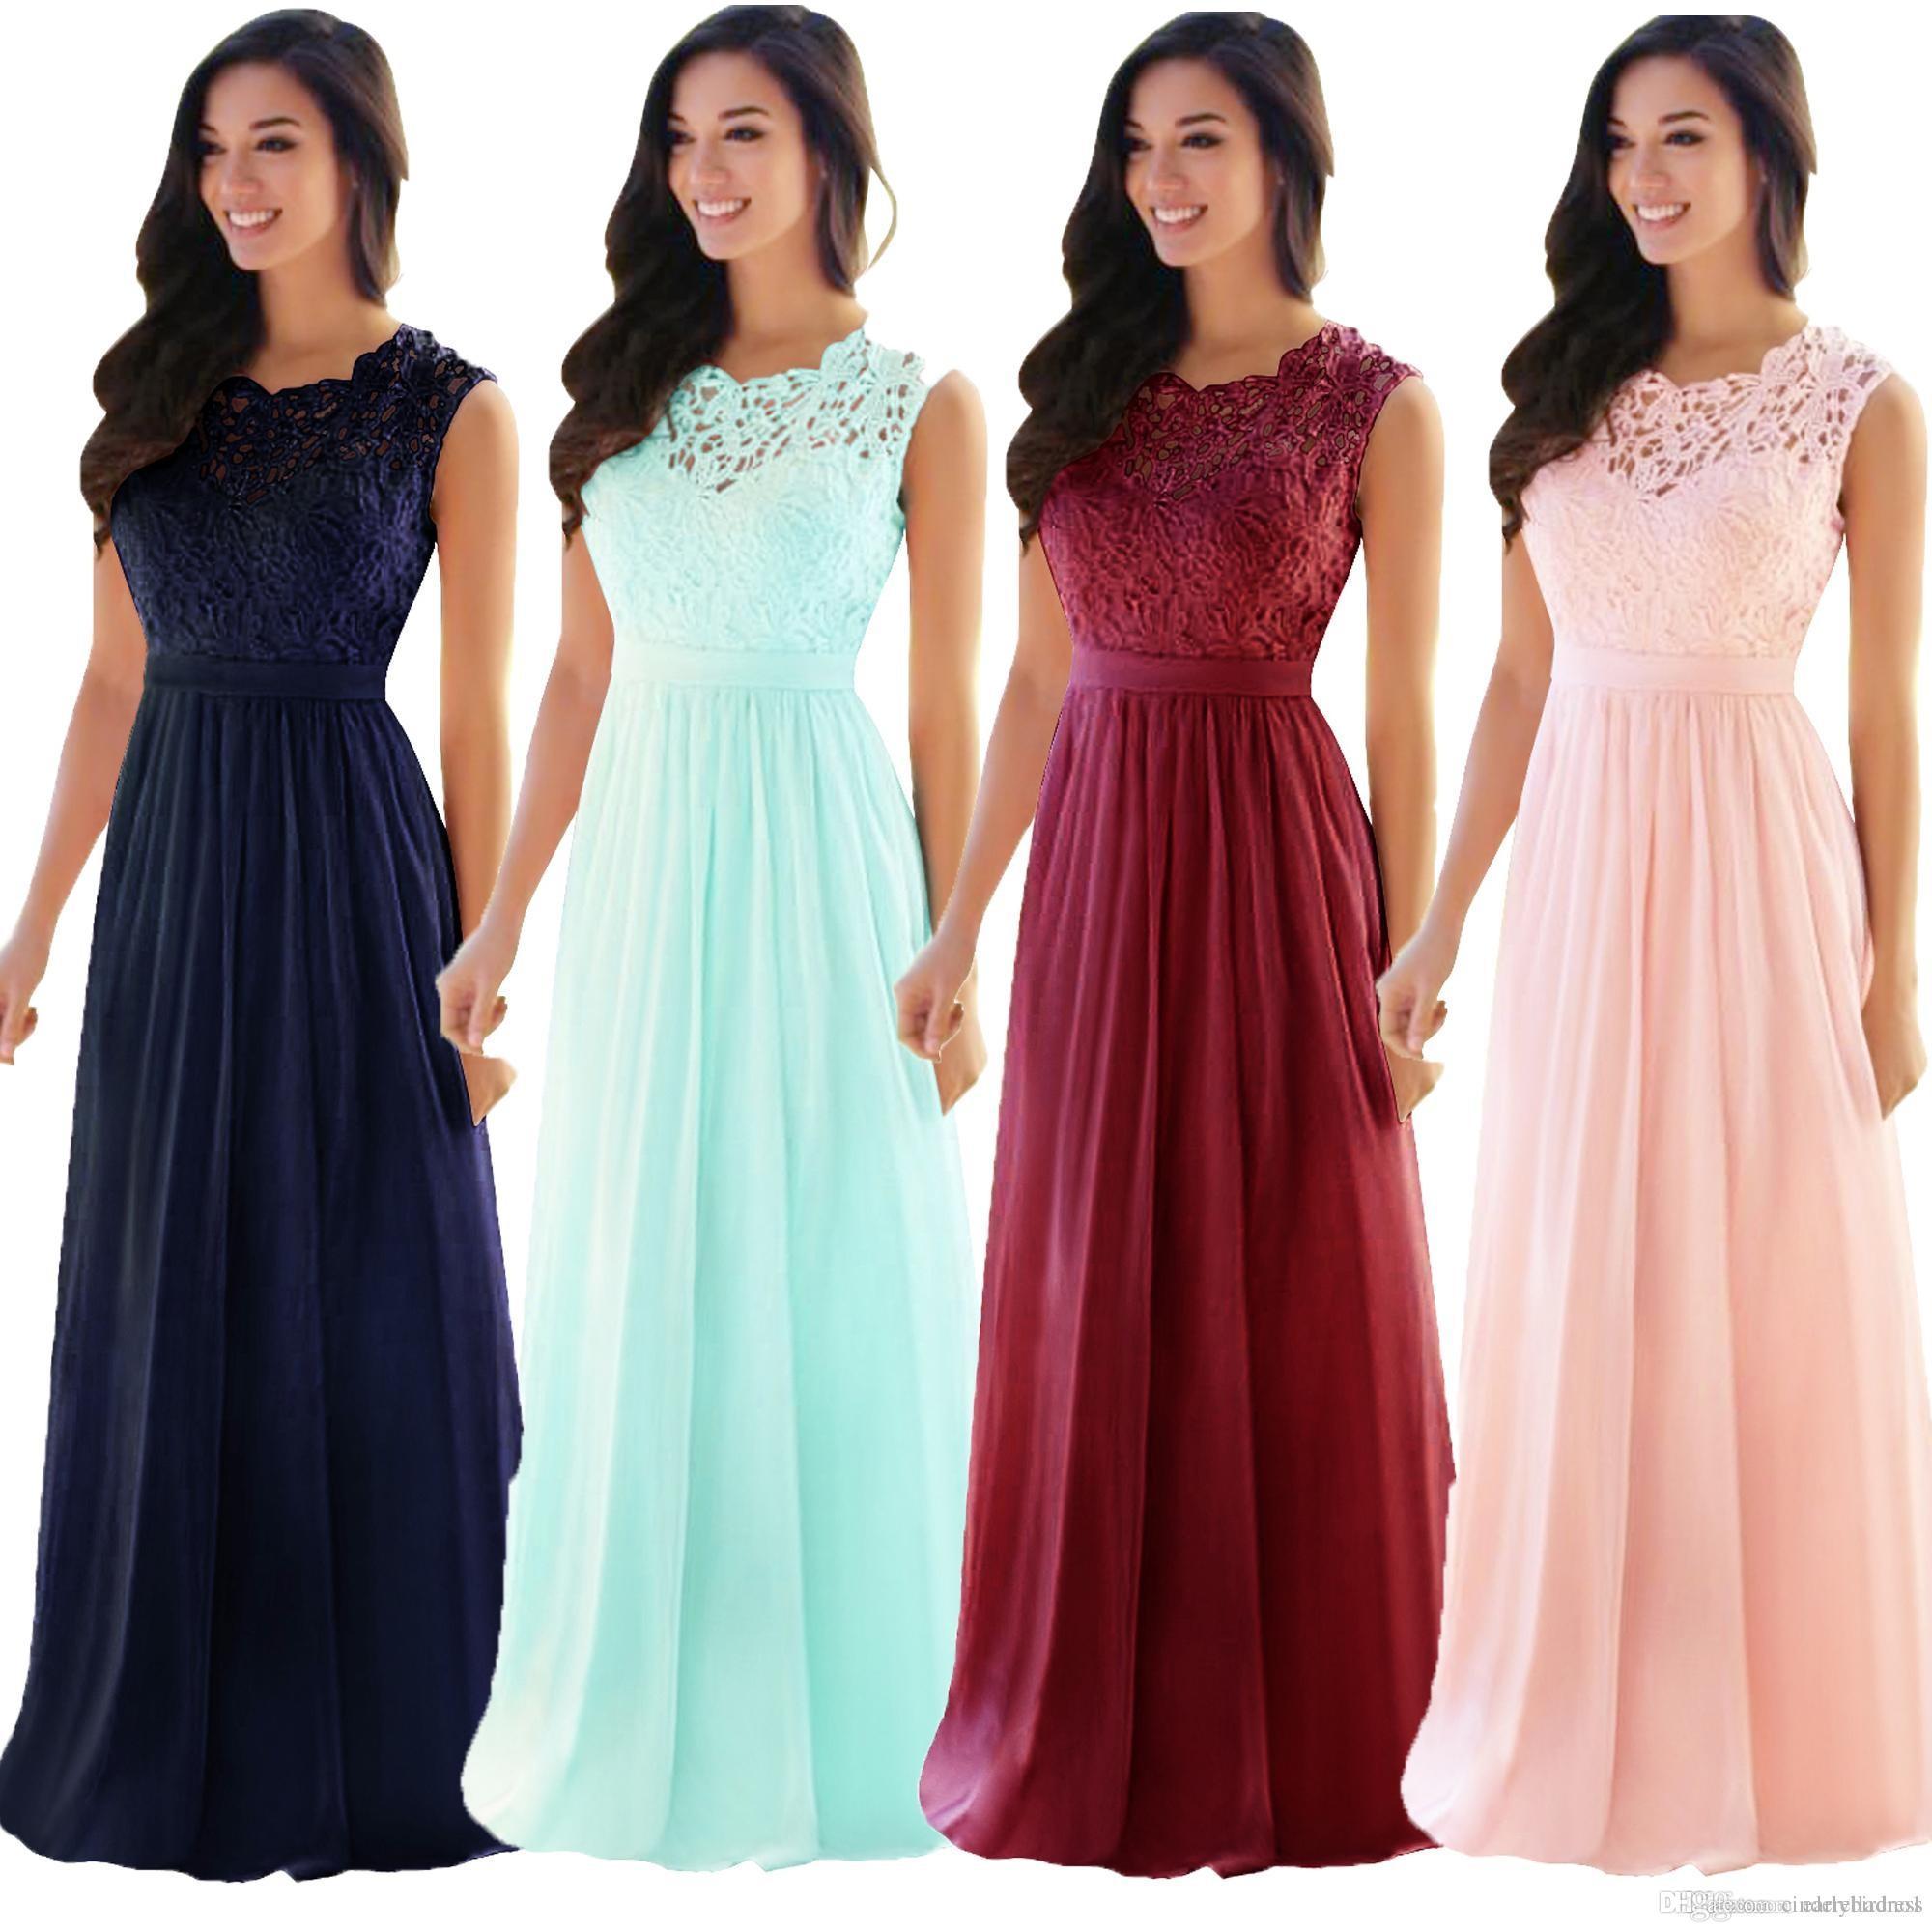 Discount Designer Wedding Gowns: 2019 Cheap Designer Lace Bridesmaid Dresses Jewel